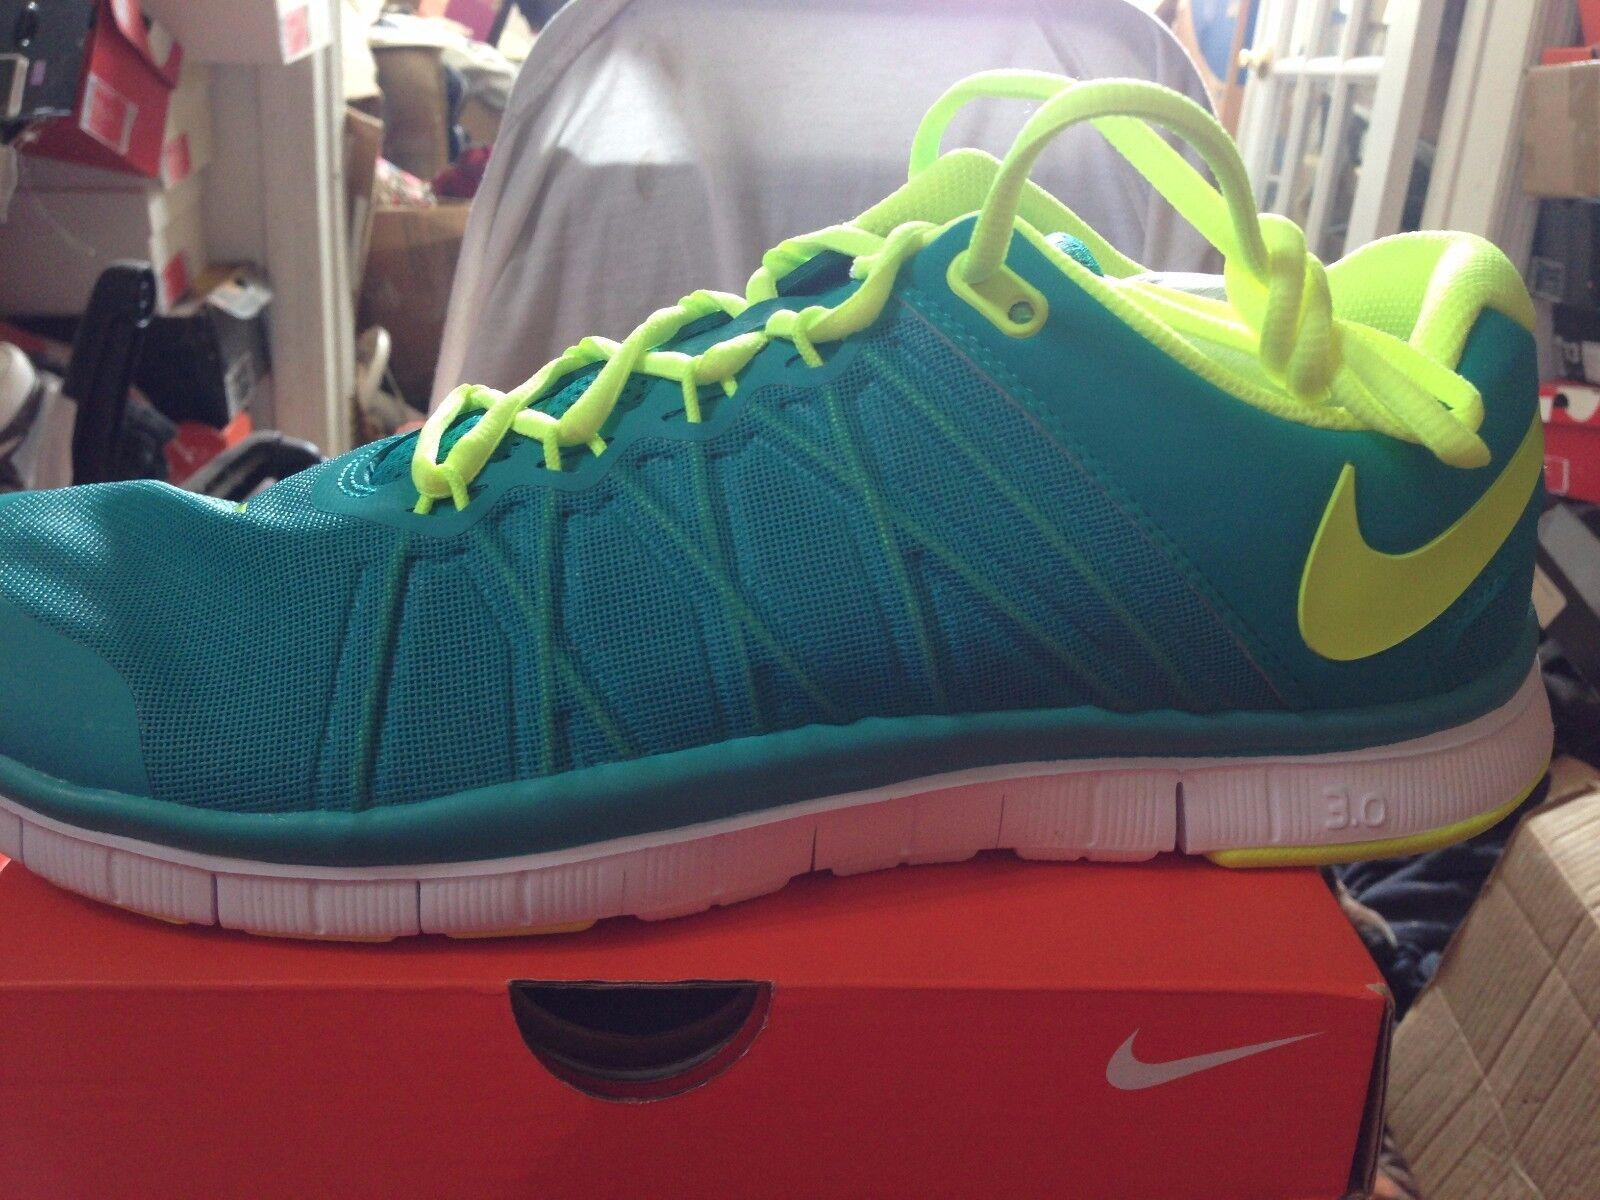 Nike libera trainer 3.0 turbo / verde / bianco / turbo volt bnib dimensioni 11,5 211312